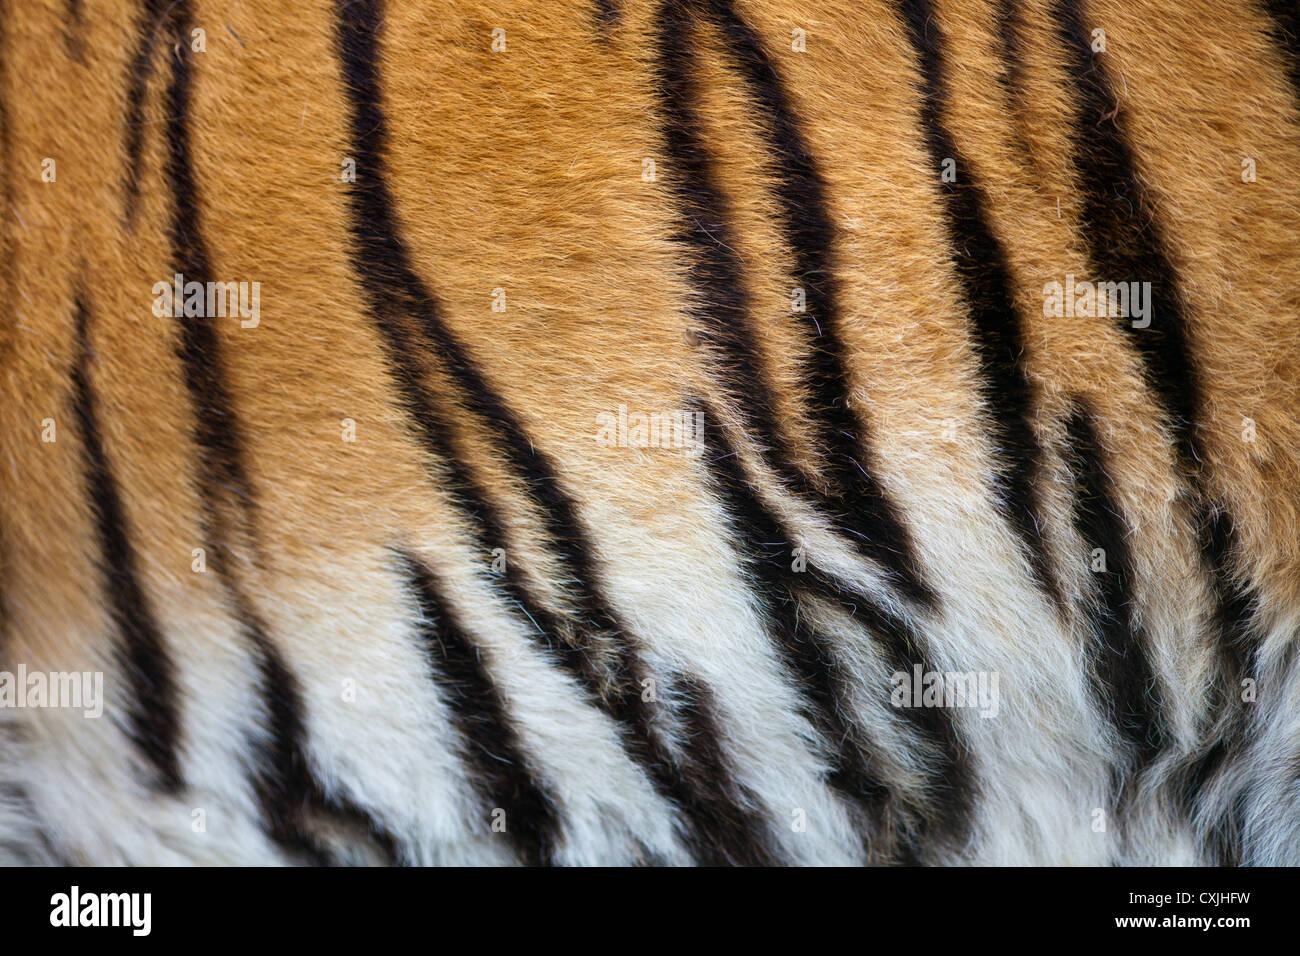 Tiger (Panthera tigris) coat - Stock Image